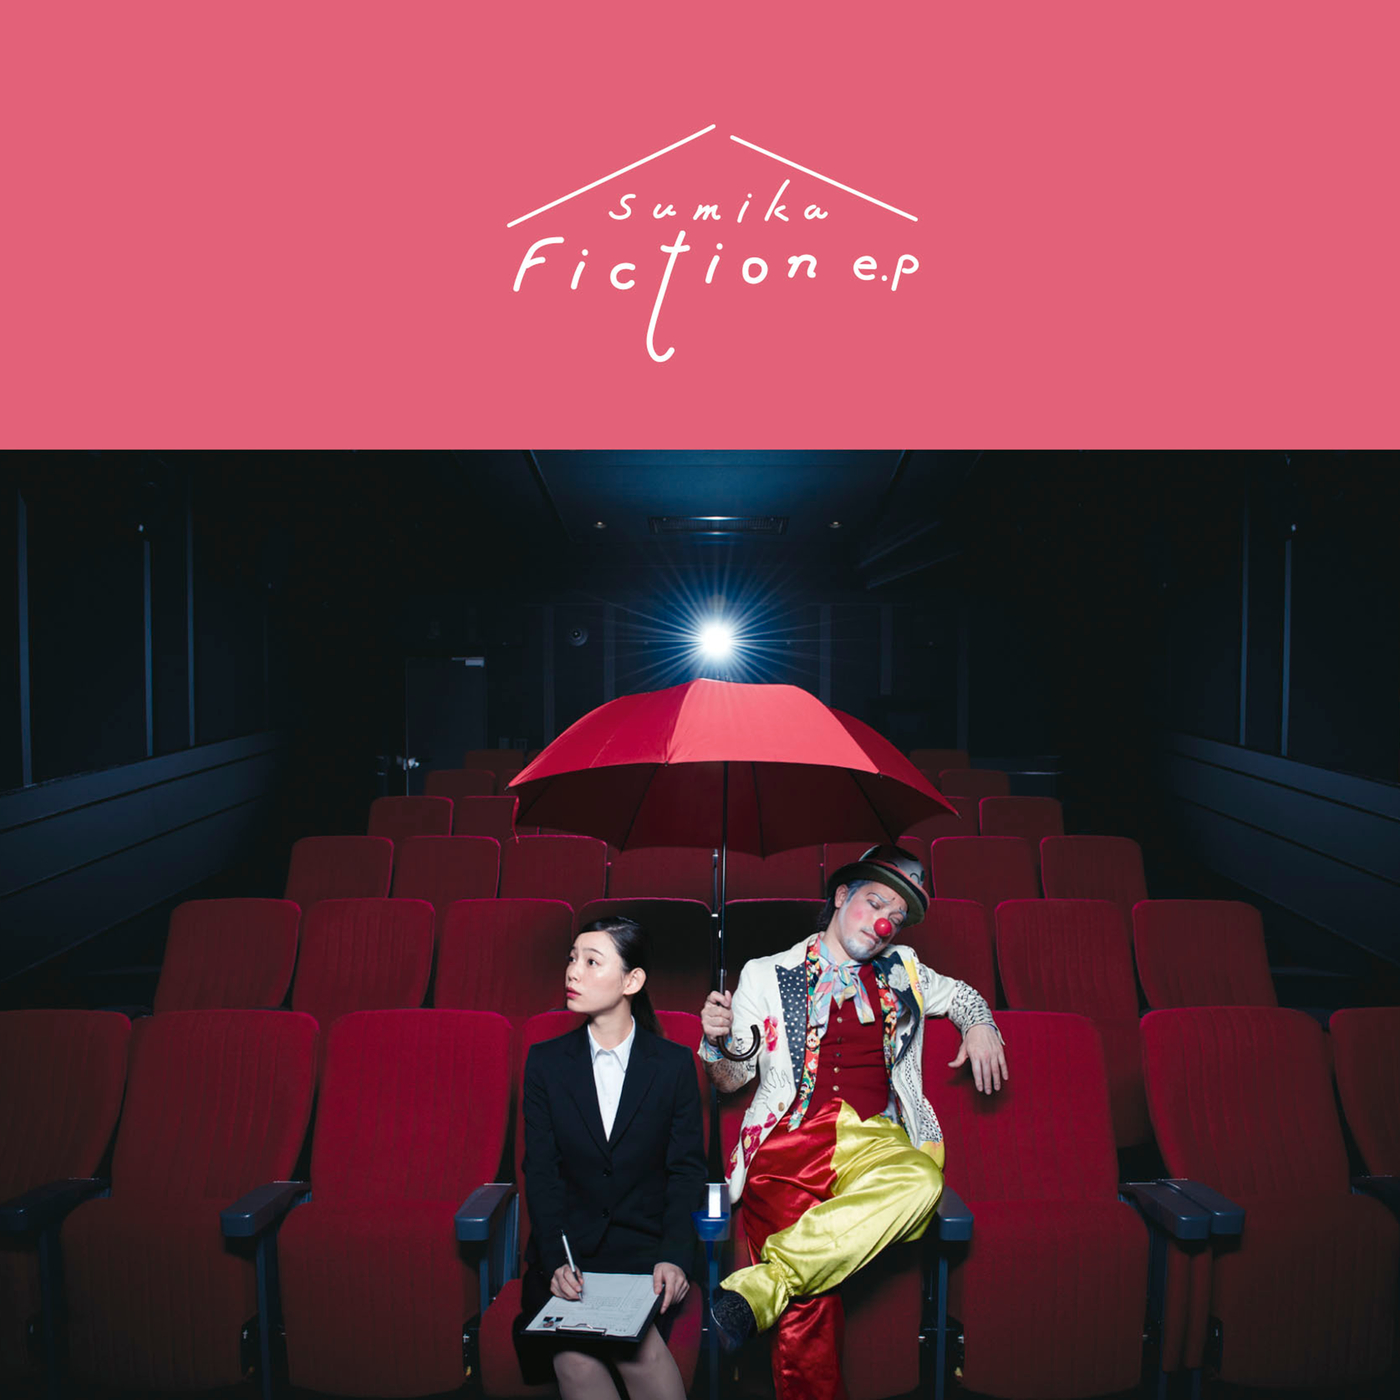 Fiction -EP - sumika